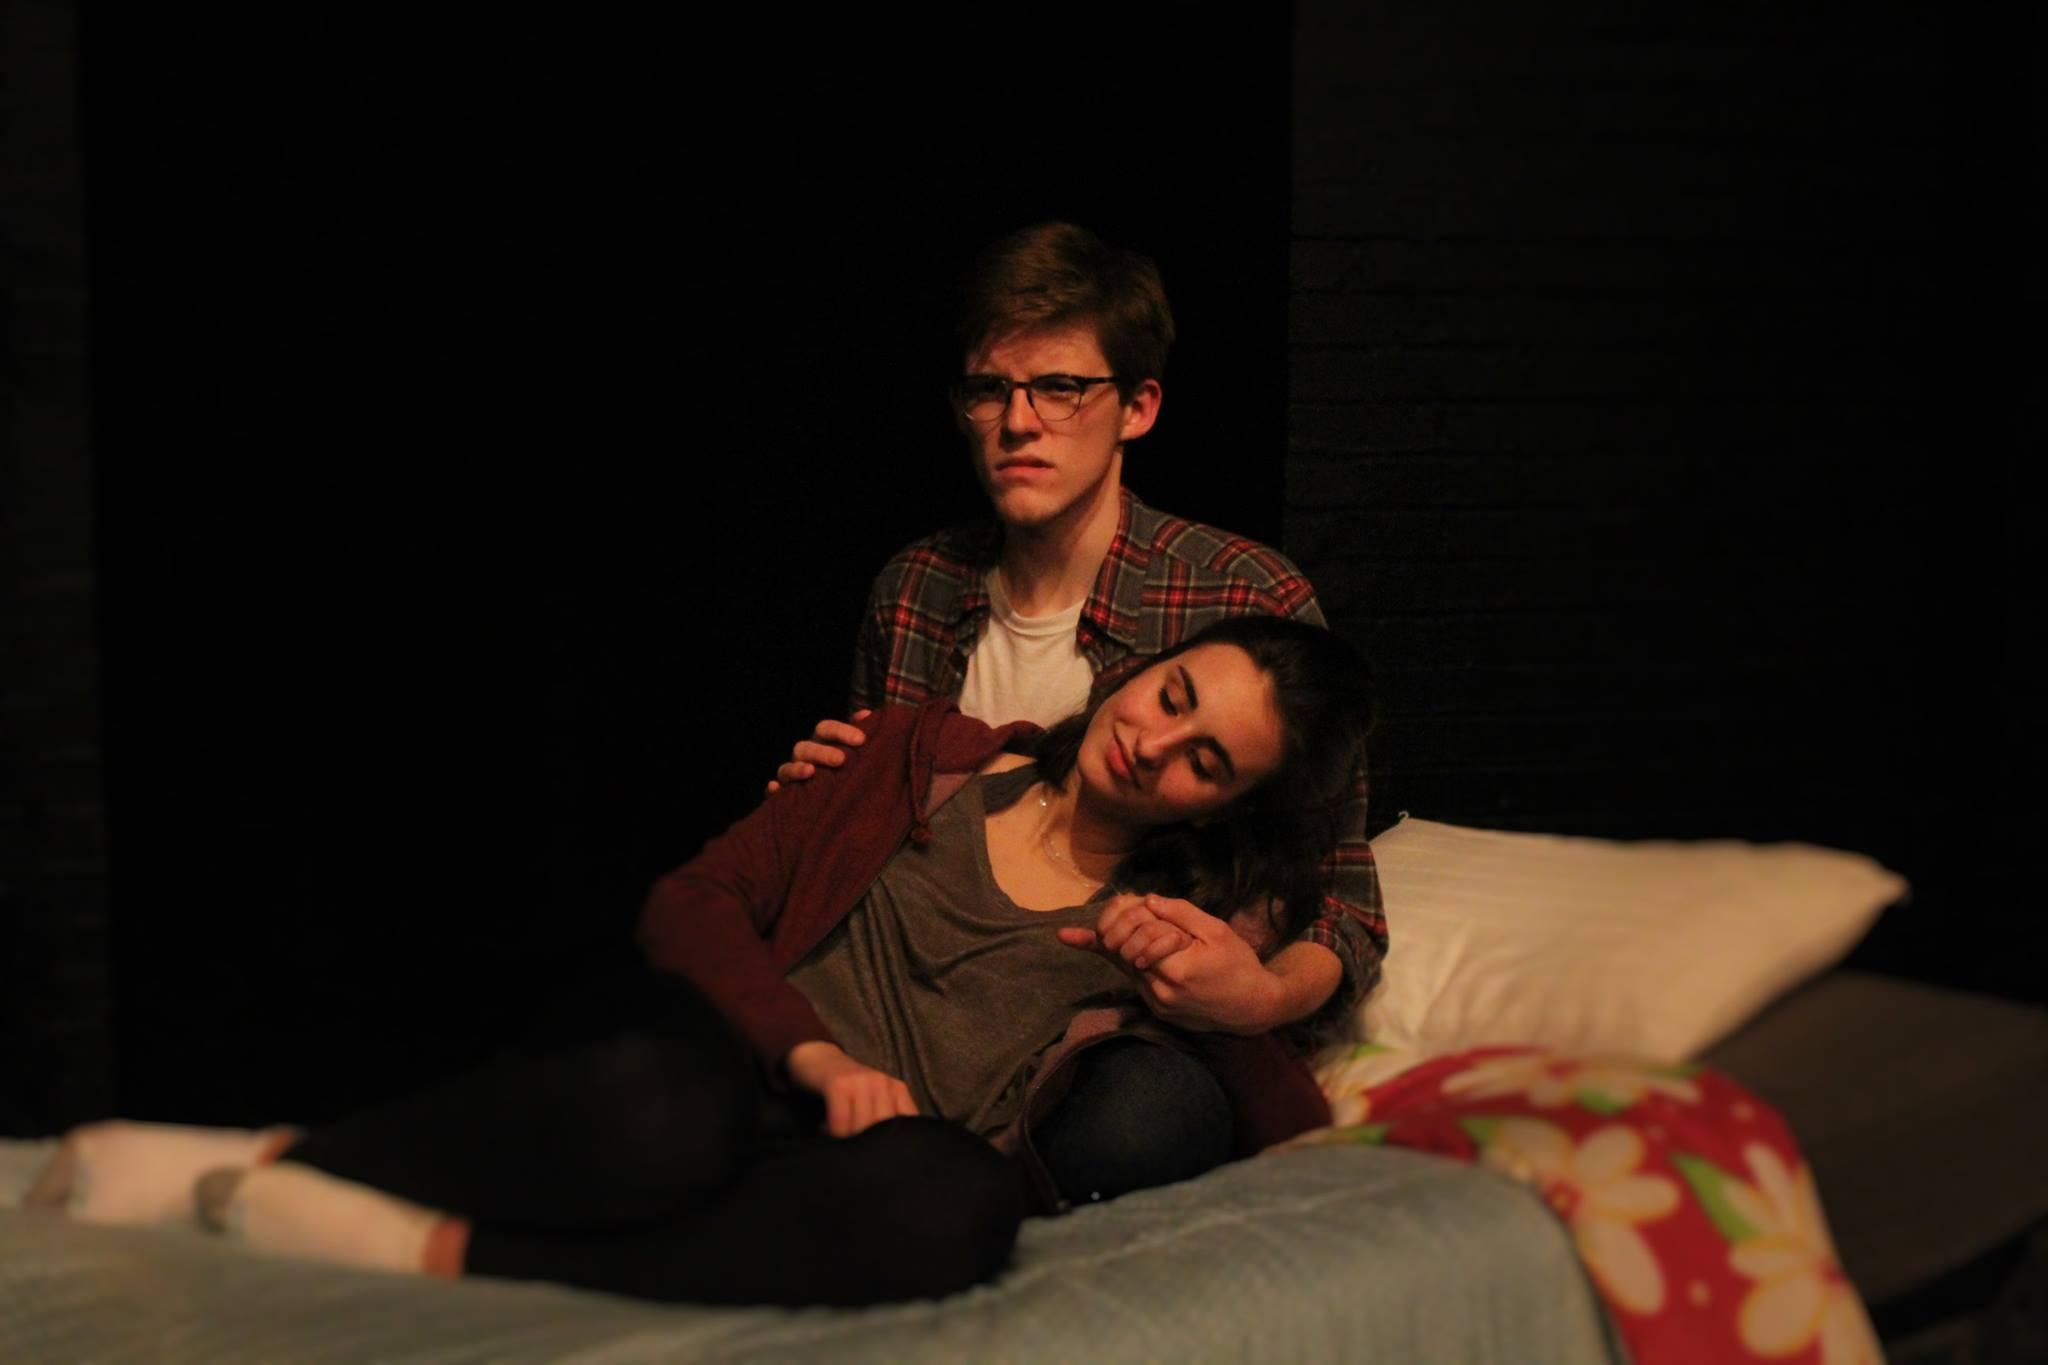 Cooper (Gus Mahoney) consoles Lola (Nora Spadoni) in the artful show